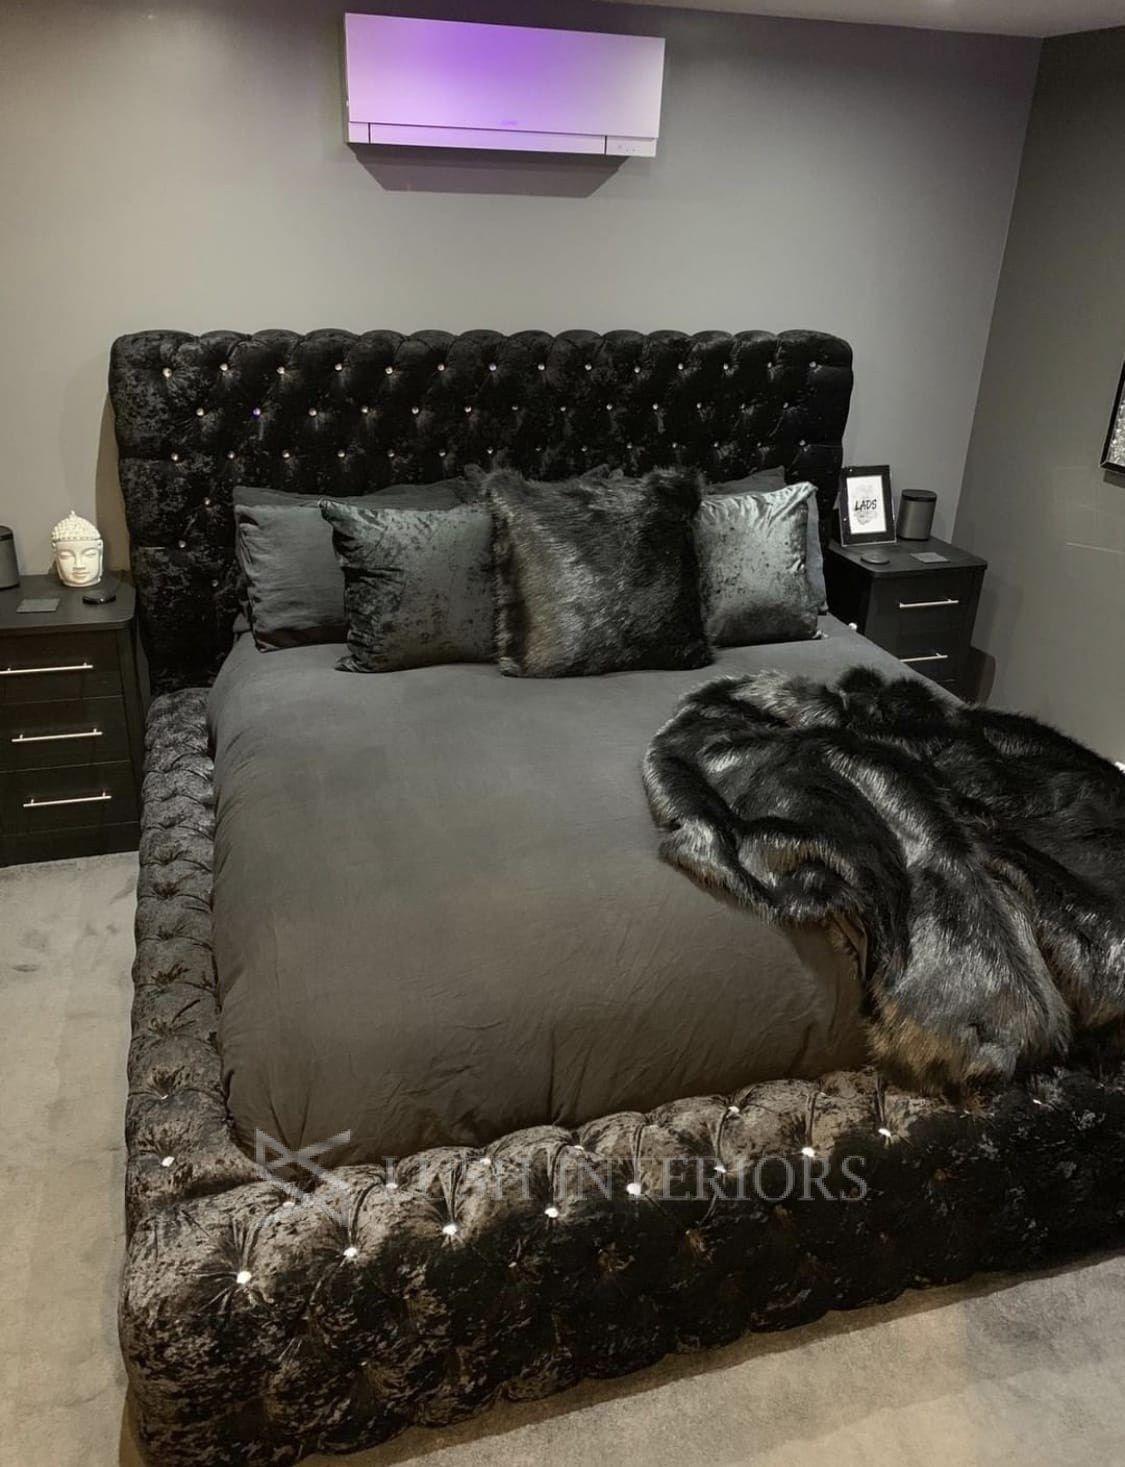 Park Lane Bed Lush Interiors Luxurious Bedrooms Room Ideas Bedroom Luxury Bedroom Design